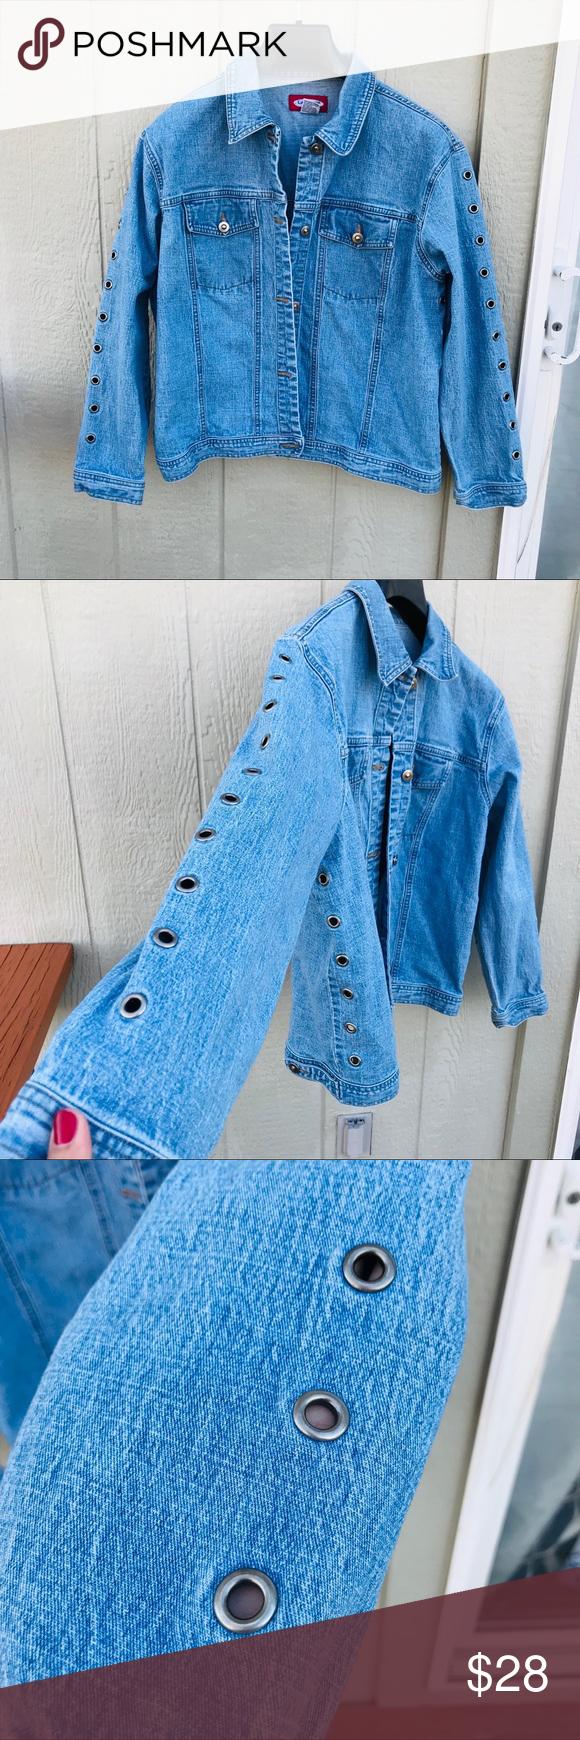 90s Vtg Denim Jean Jacket Studded Hole Accents Vintage Jean Jacket Vintage Jeans Denim Jean Jacket [ 1740 x 580 Pixel ]